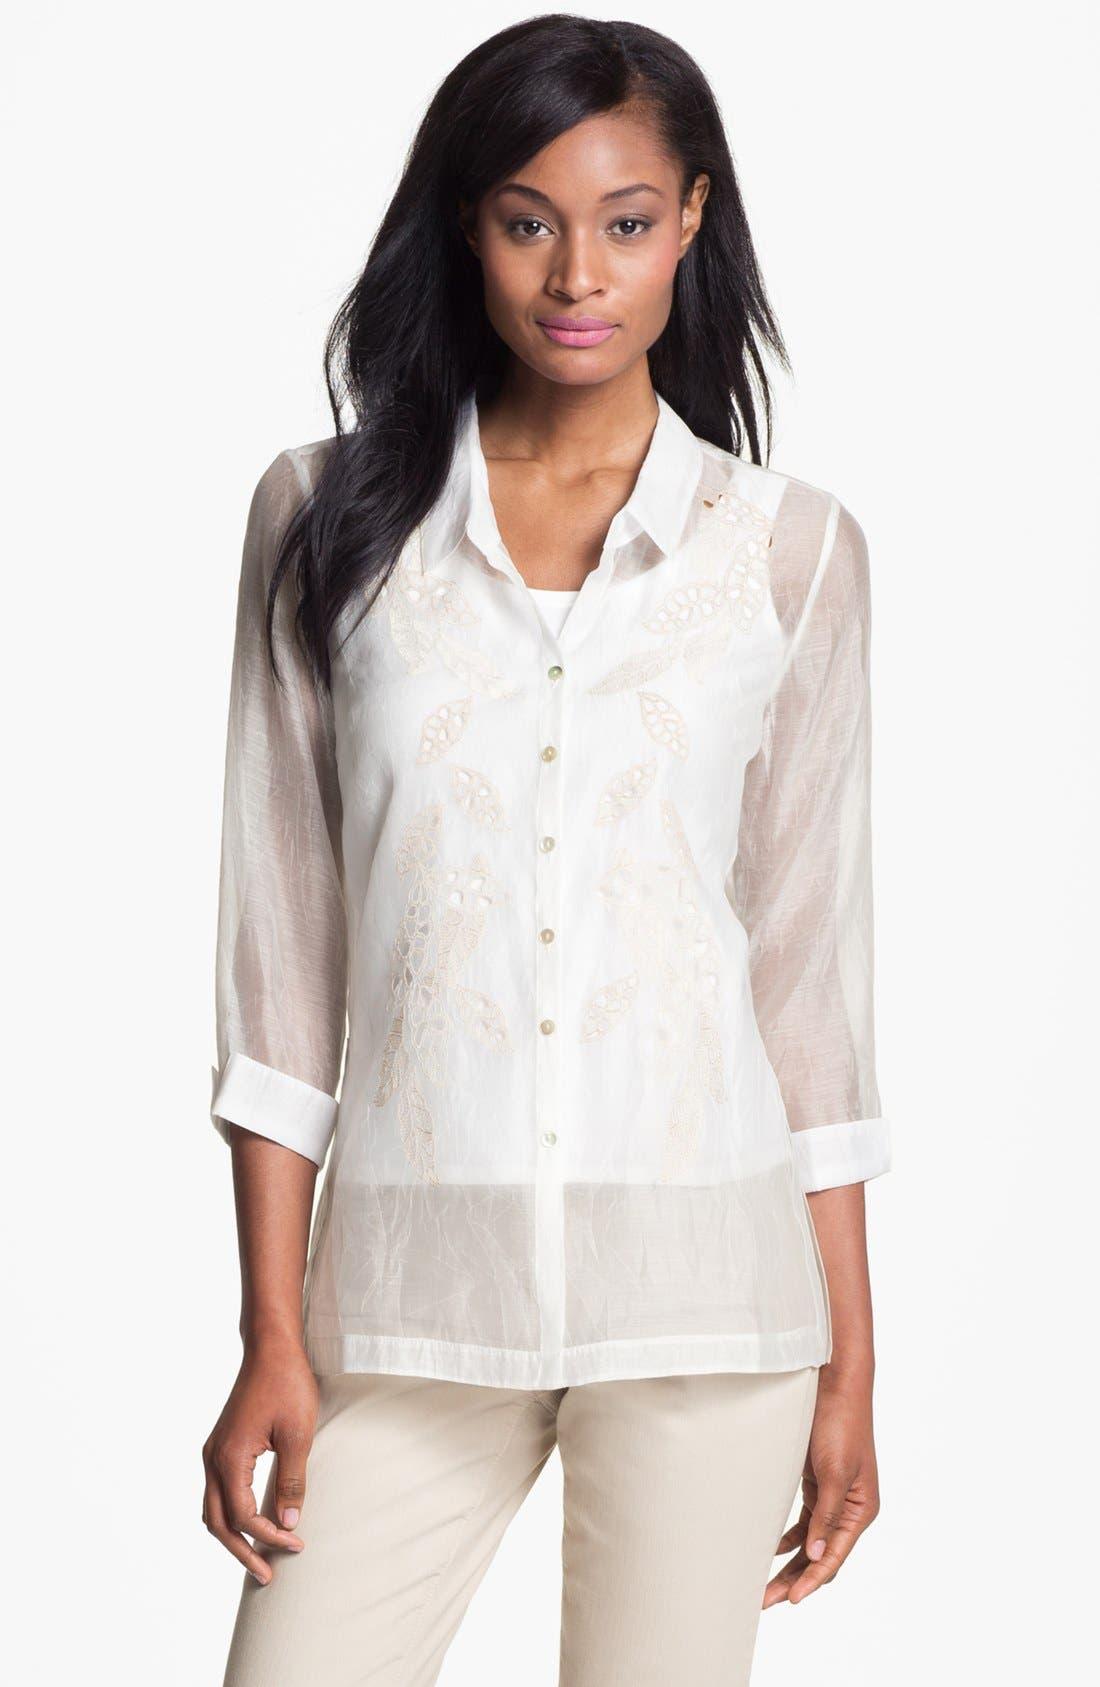 Main Image - Nic + Zoe 'Embroidered Shores' Shirt